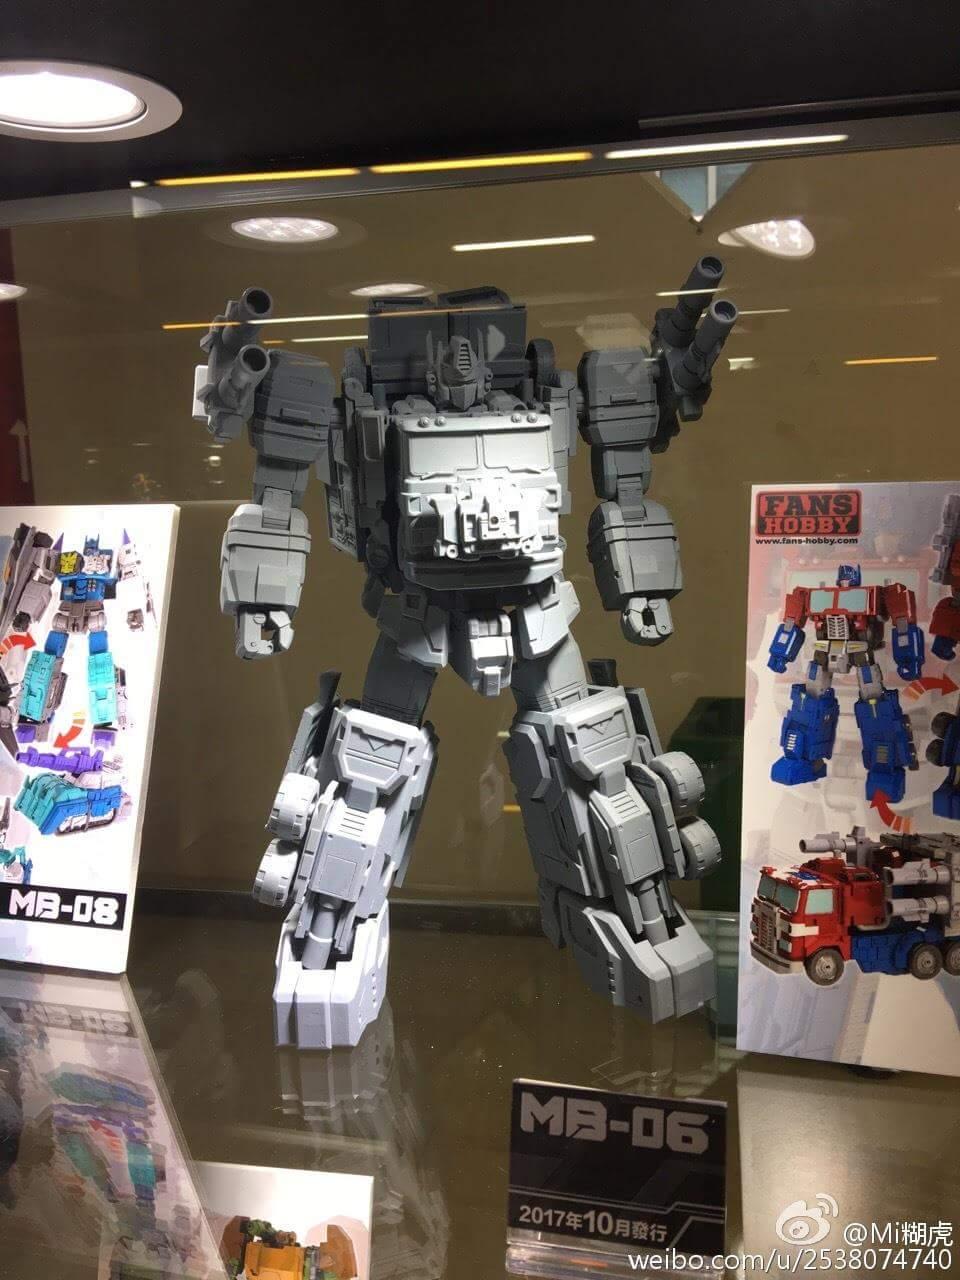 [FansHobby] Produit Tiers - MB-06 Power Baser (aka Powermaster Optimus) + MB-11 God Armour (aka Godbomber) - TF Masterforce UDcdnLKd